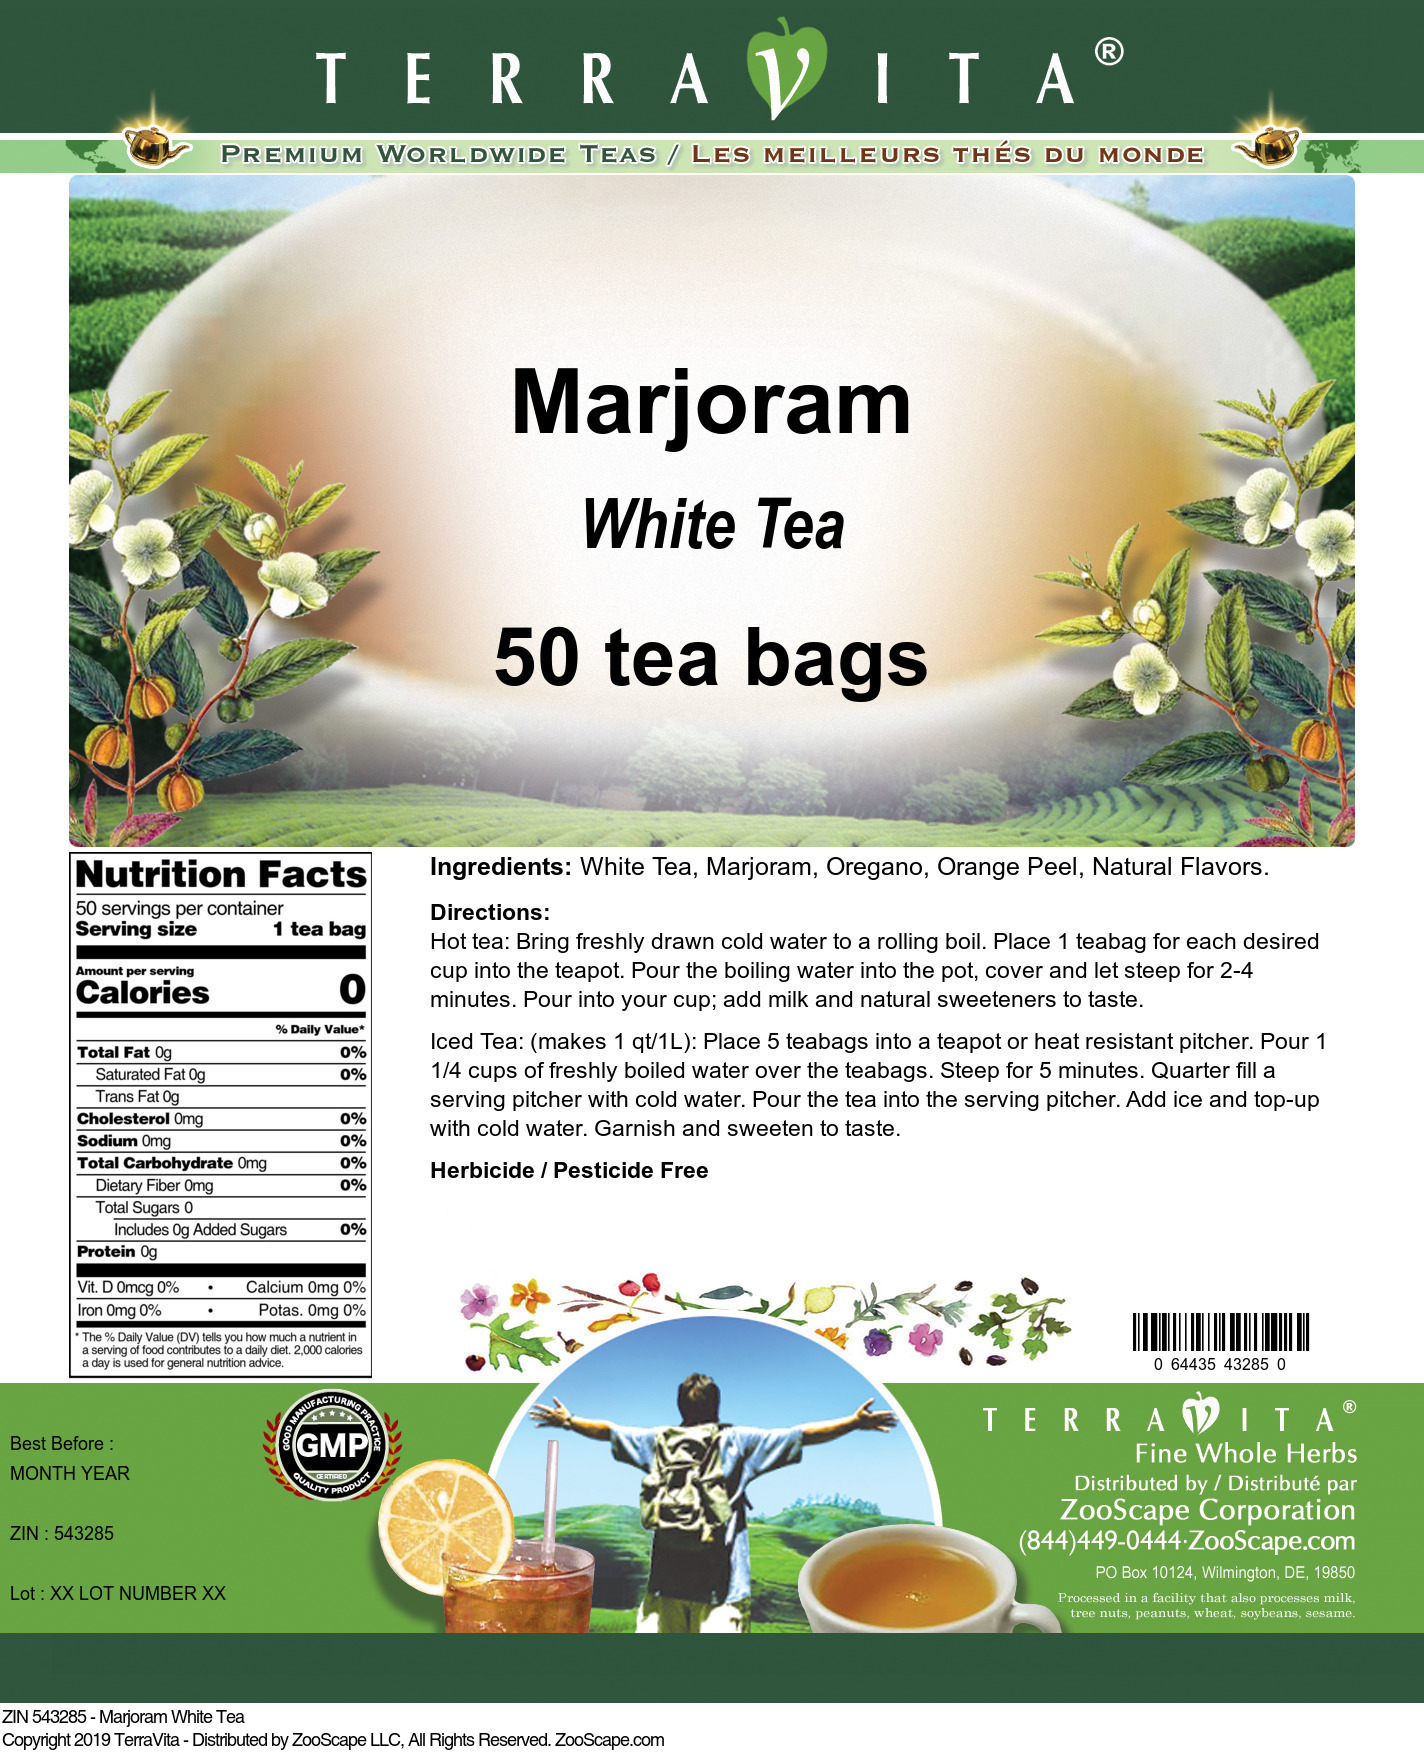 Marjoram White Tea